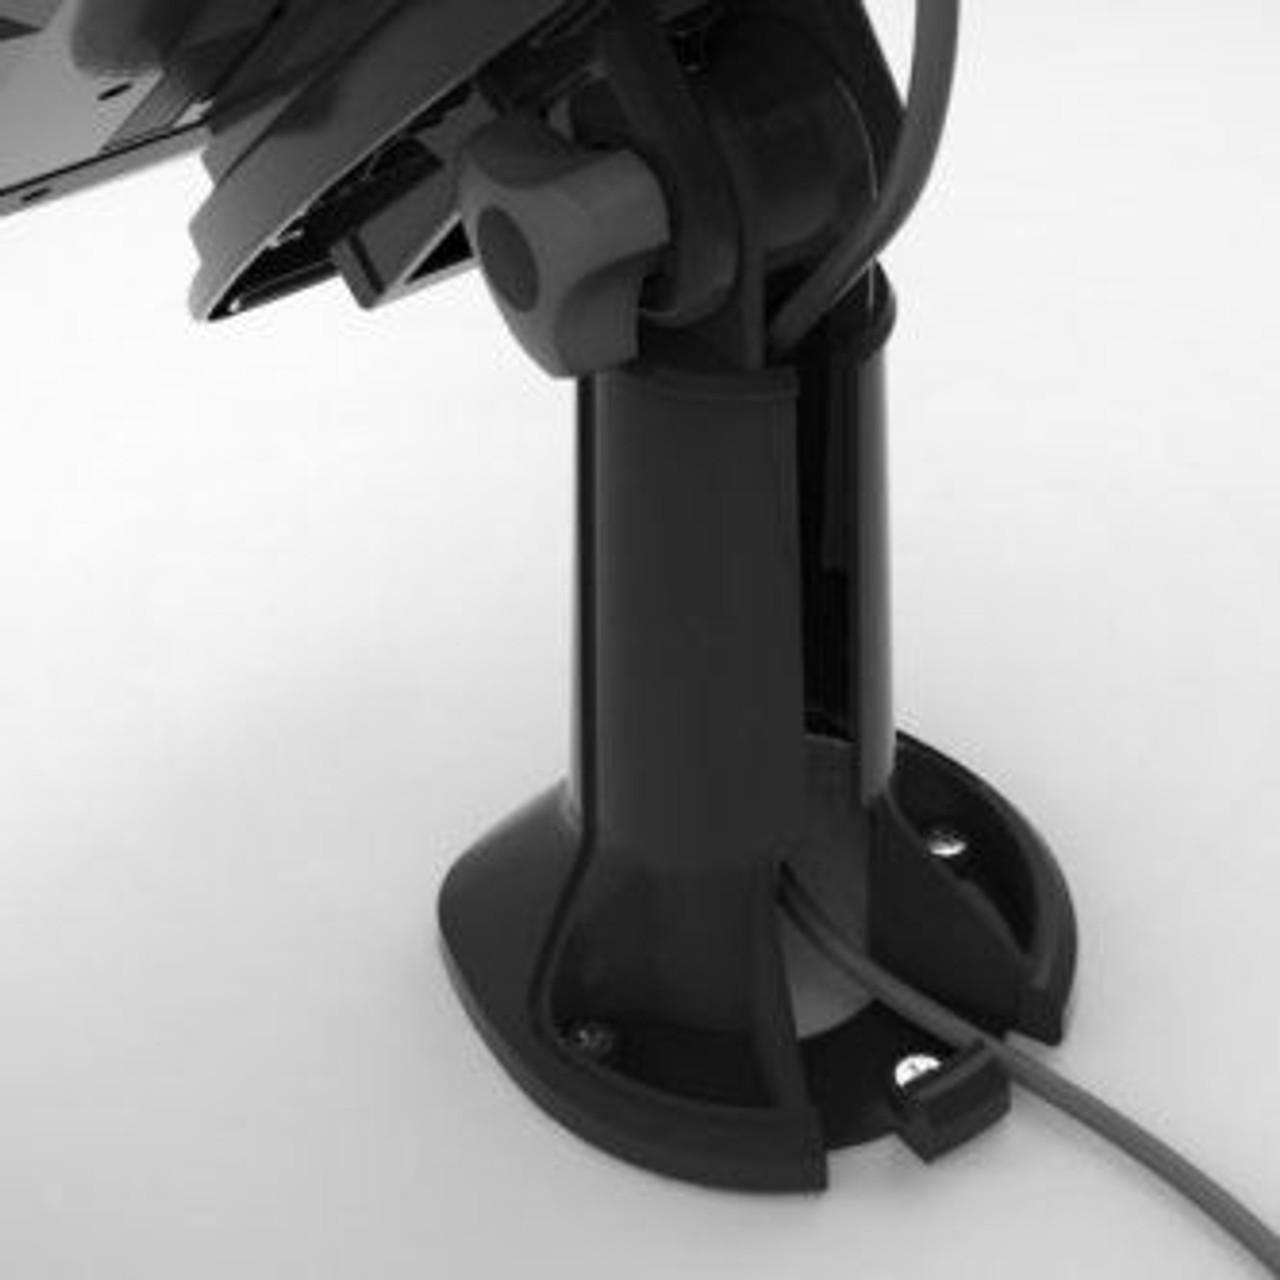 Verifone VX805 VX820 Tailwind FlexiPole Plus Stand